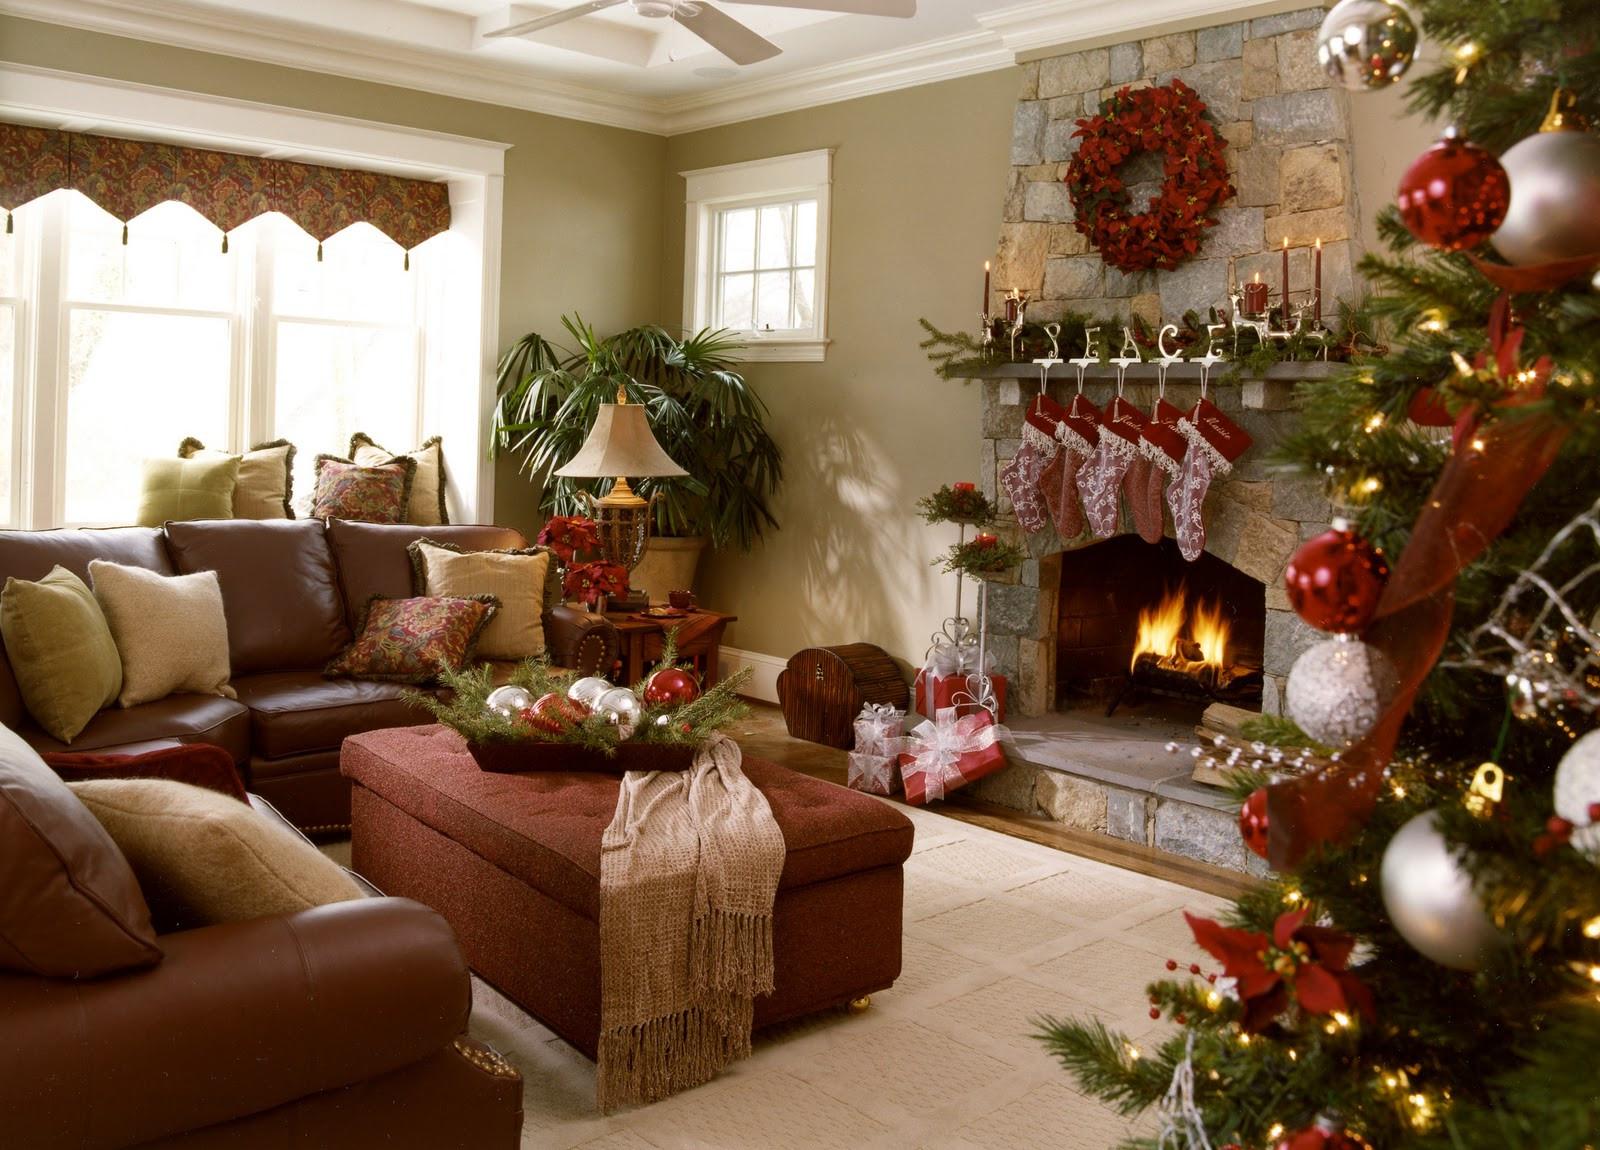 Christmas Living Room Ideas  Residential Holiday Decor & Installation